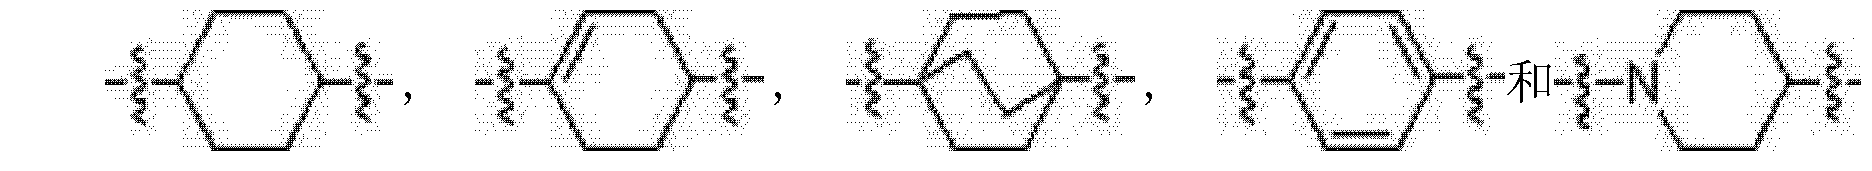 Figure CN102378762AD00251